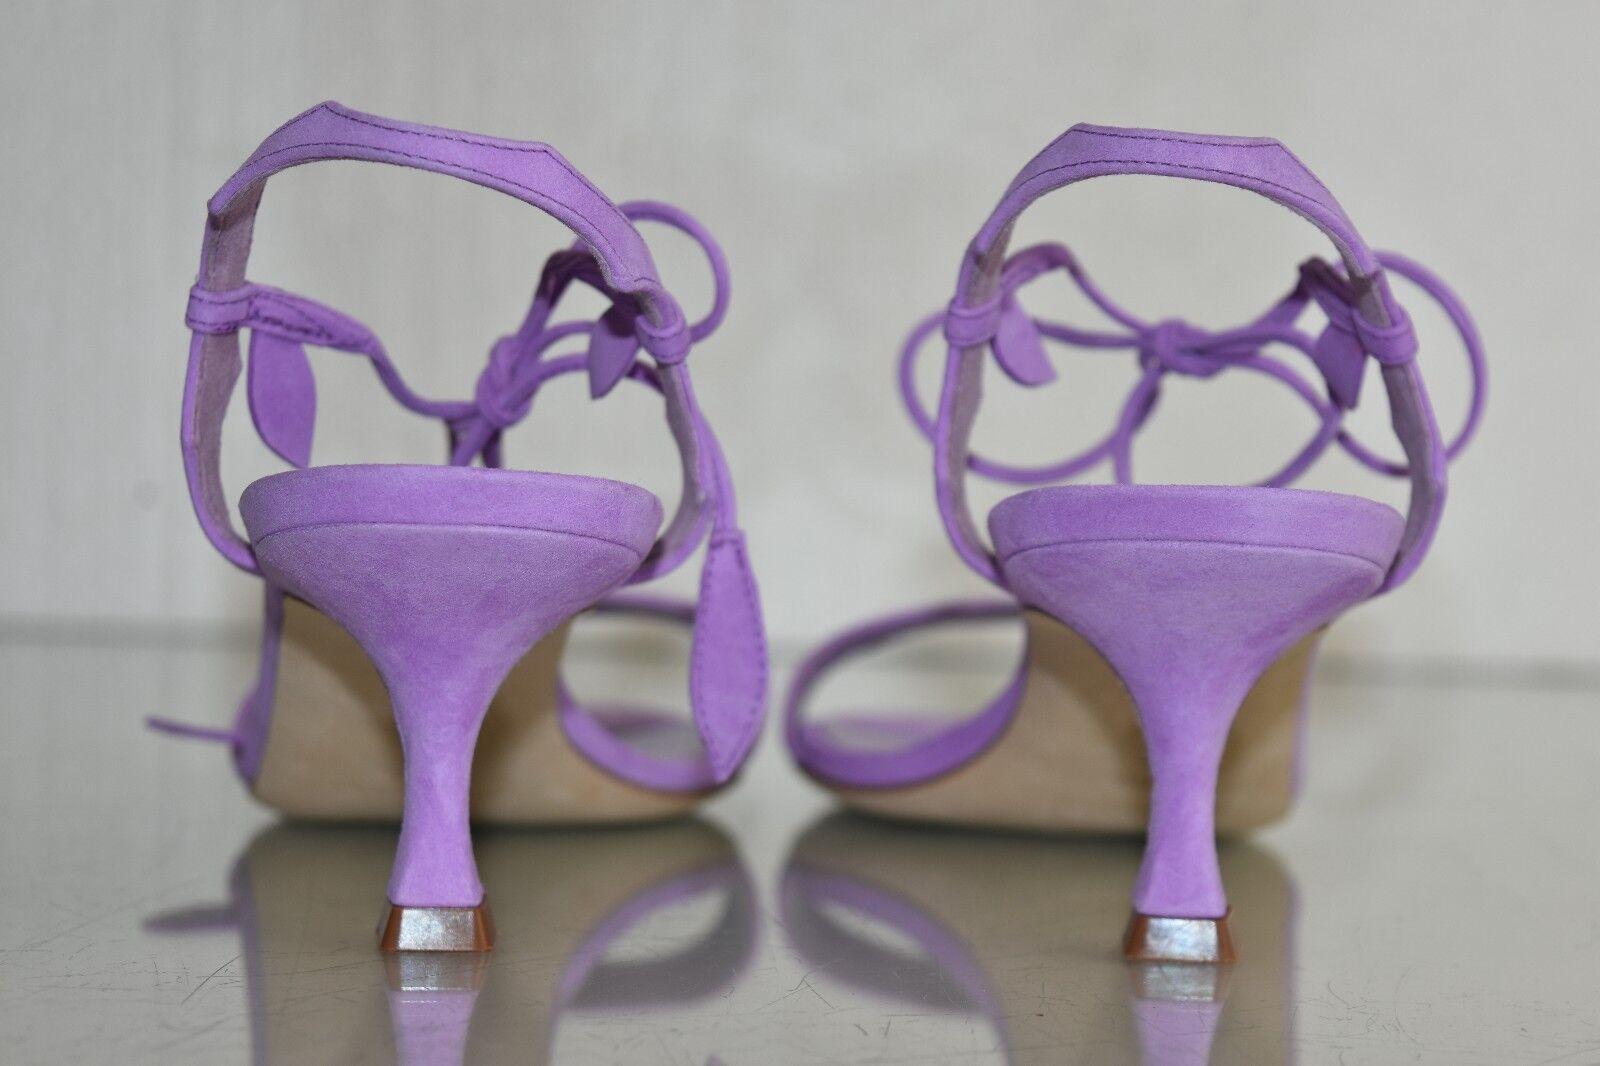 Neuf Manolo Blahnik Zouliplain 50 Chaton Sandales Violet Lavande Lavande Lavande Chaussures Daim ebf1ba